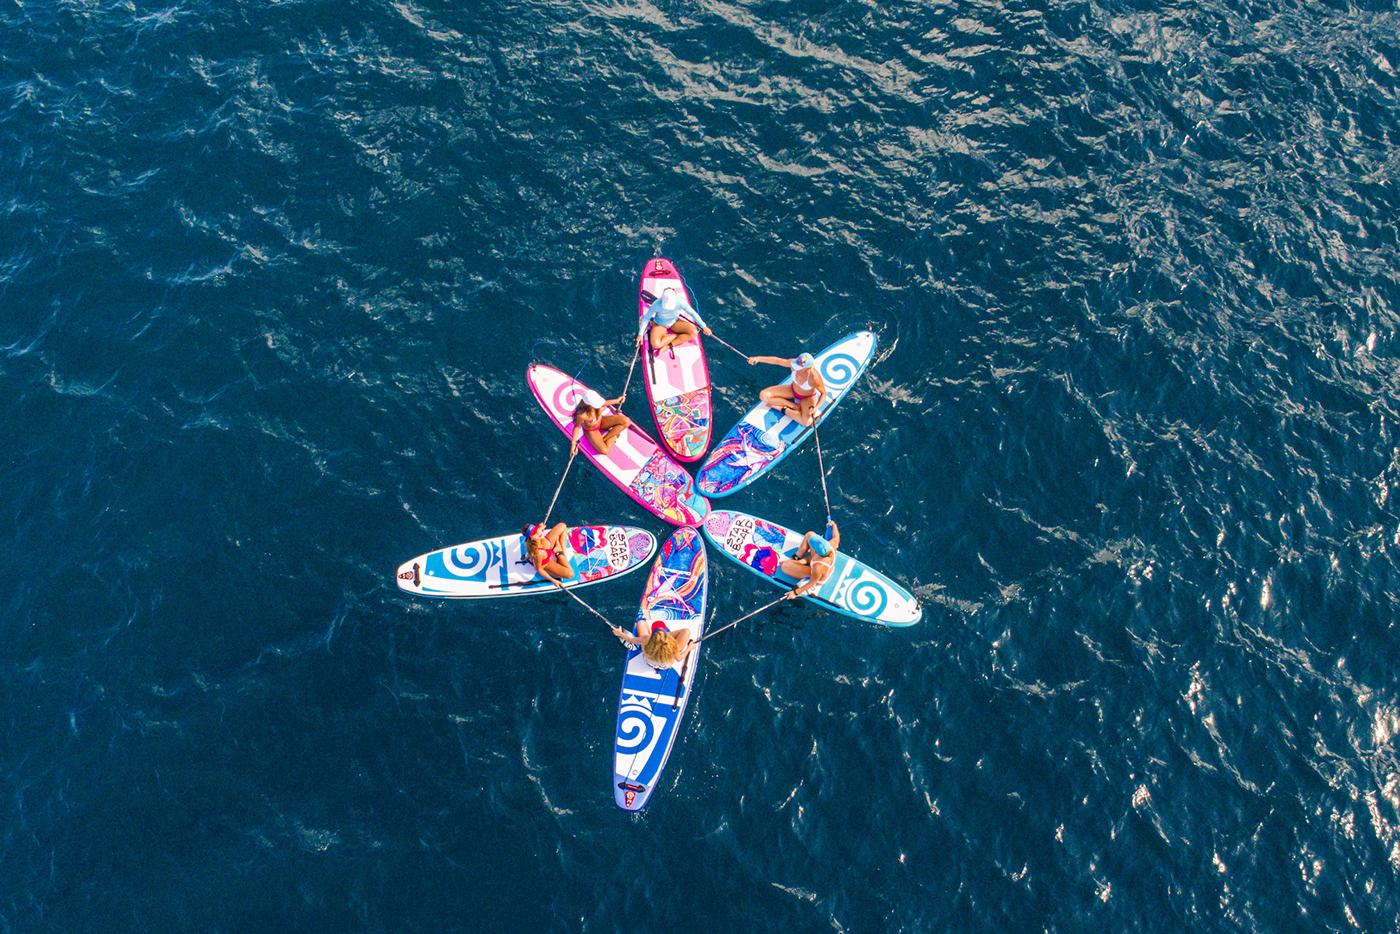 Sonni Hönscheid Sylt Germany Carolina Cup wrightsville beach north carolina Blockade Runner  Robert B Butler NC Press Release Paddle League starboard